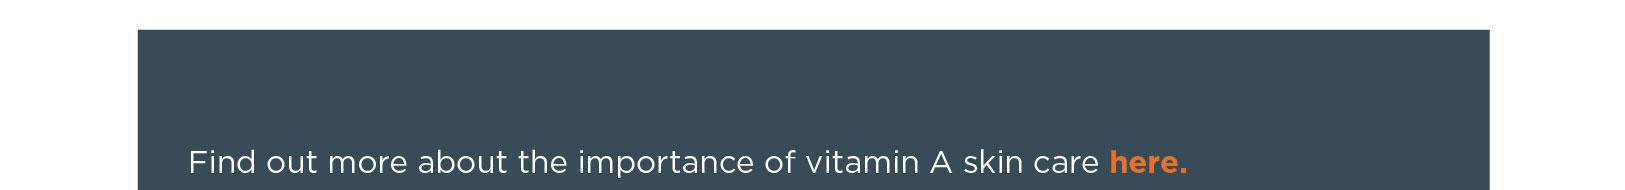 Vitamin-A Skin Care | Environ Skin Care